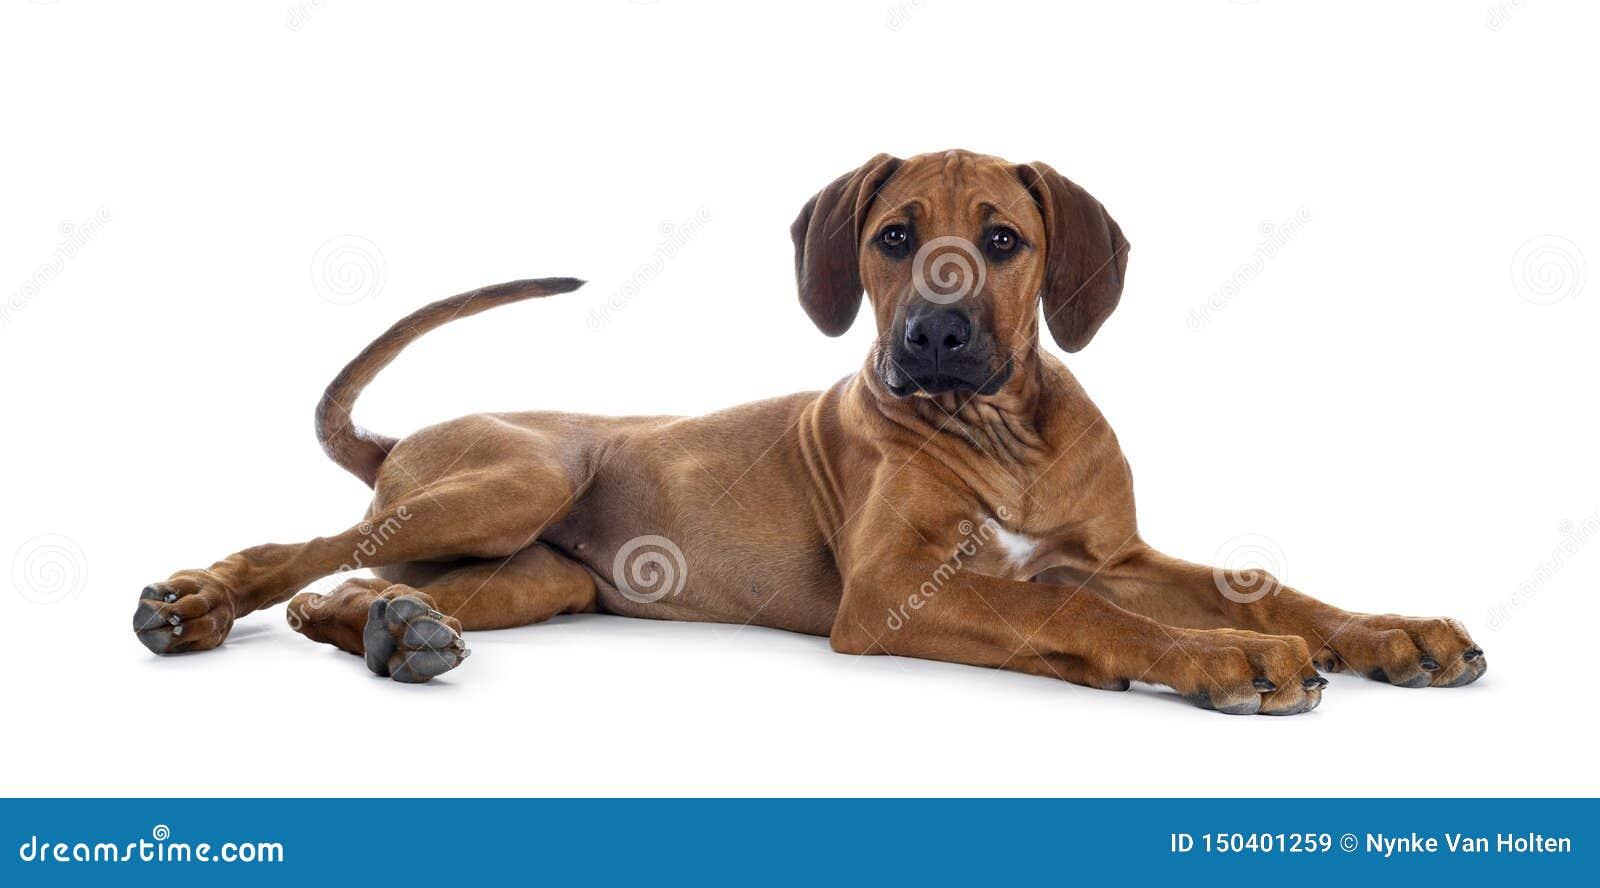 Sweet Rhodesian Ridgeback puppy on white